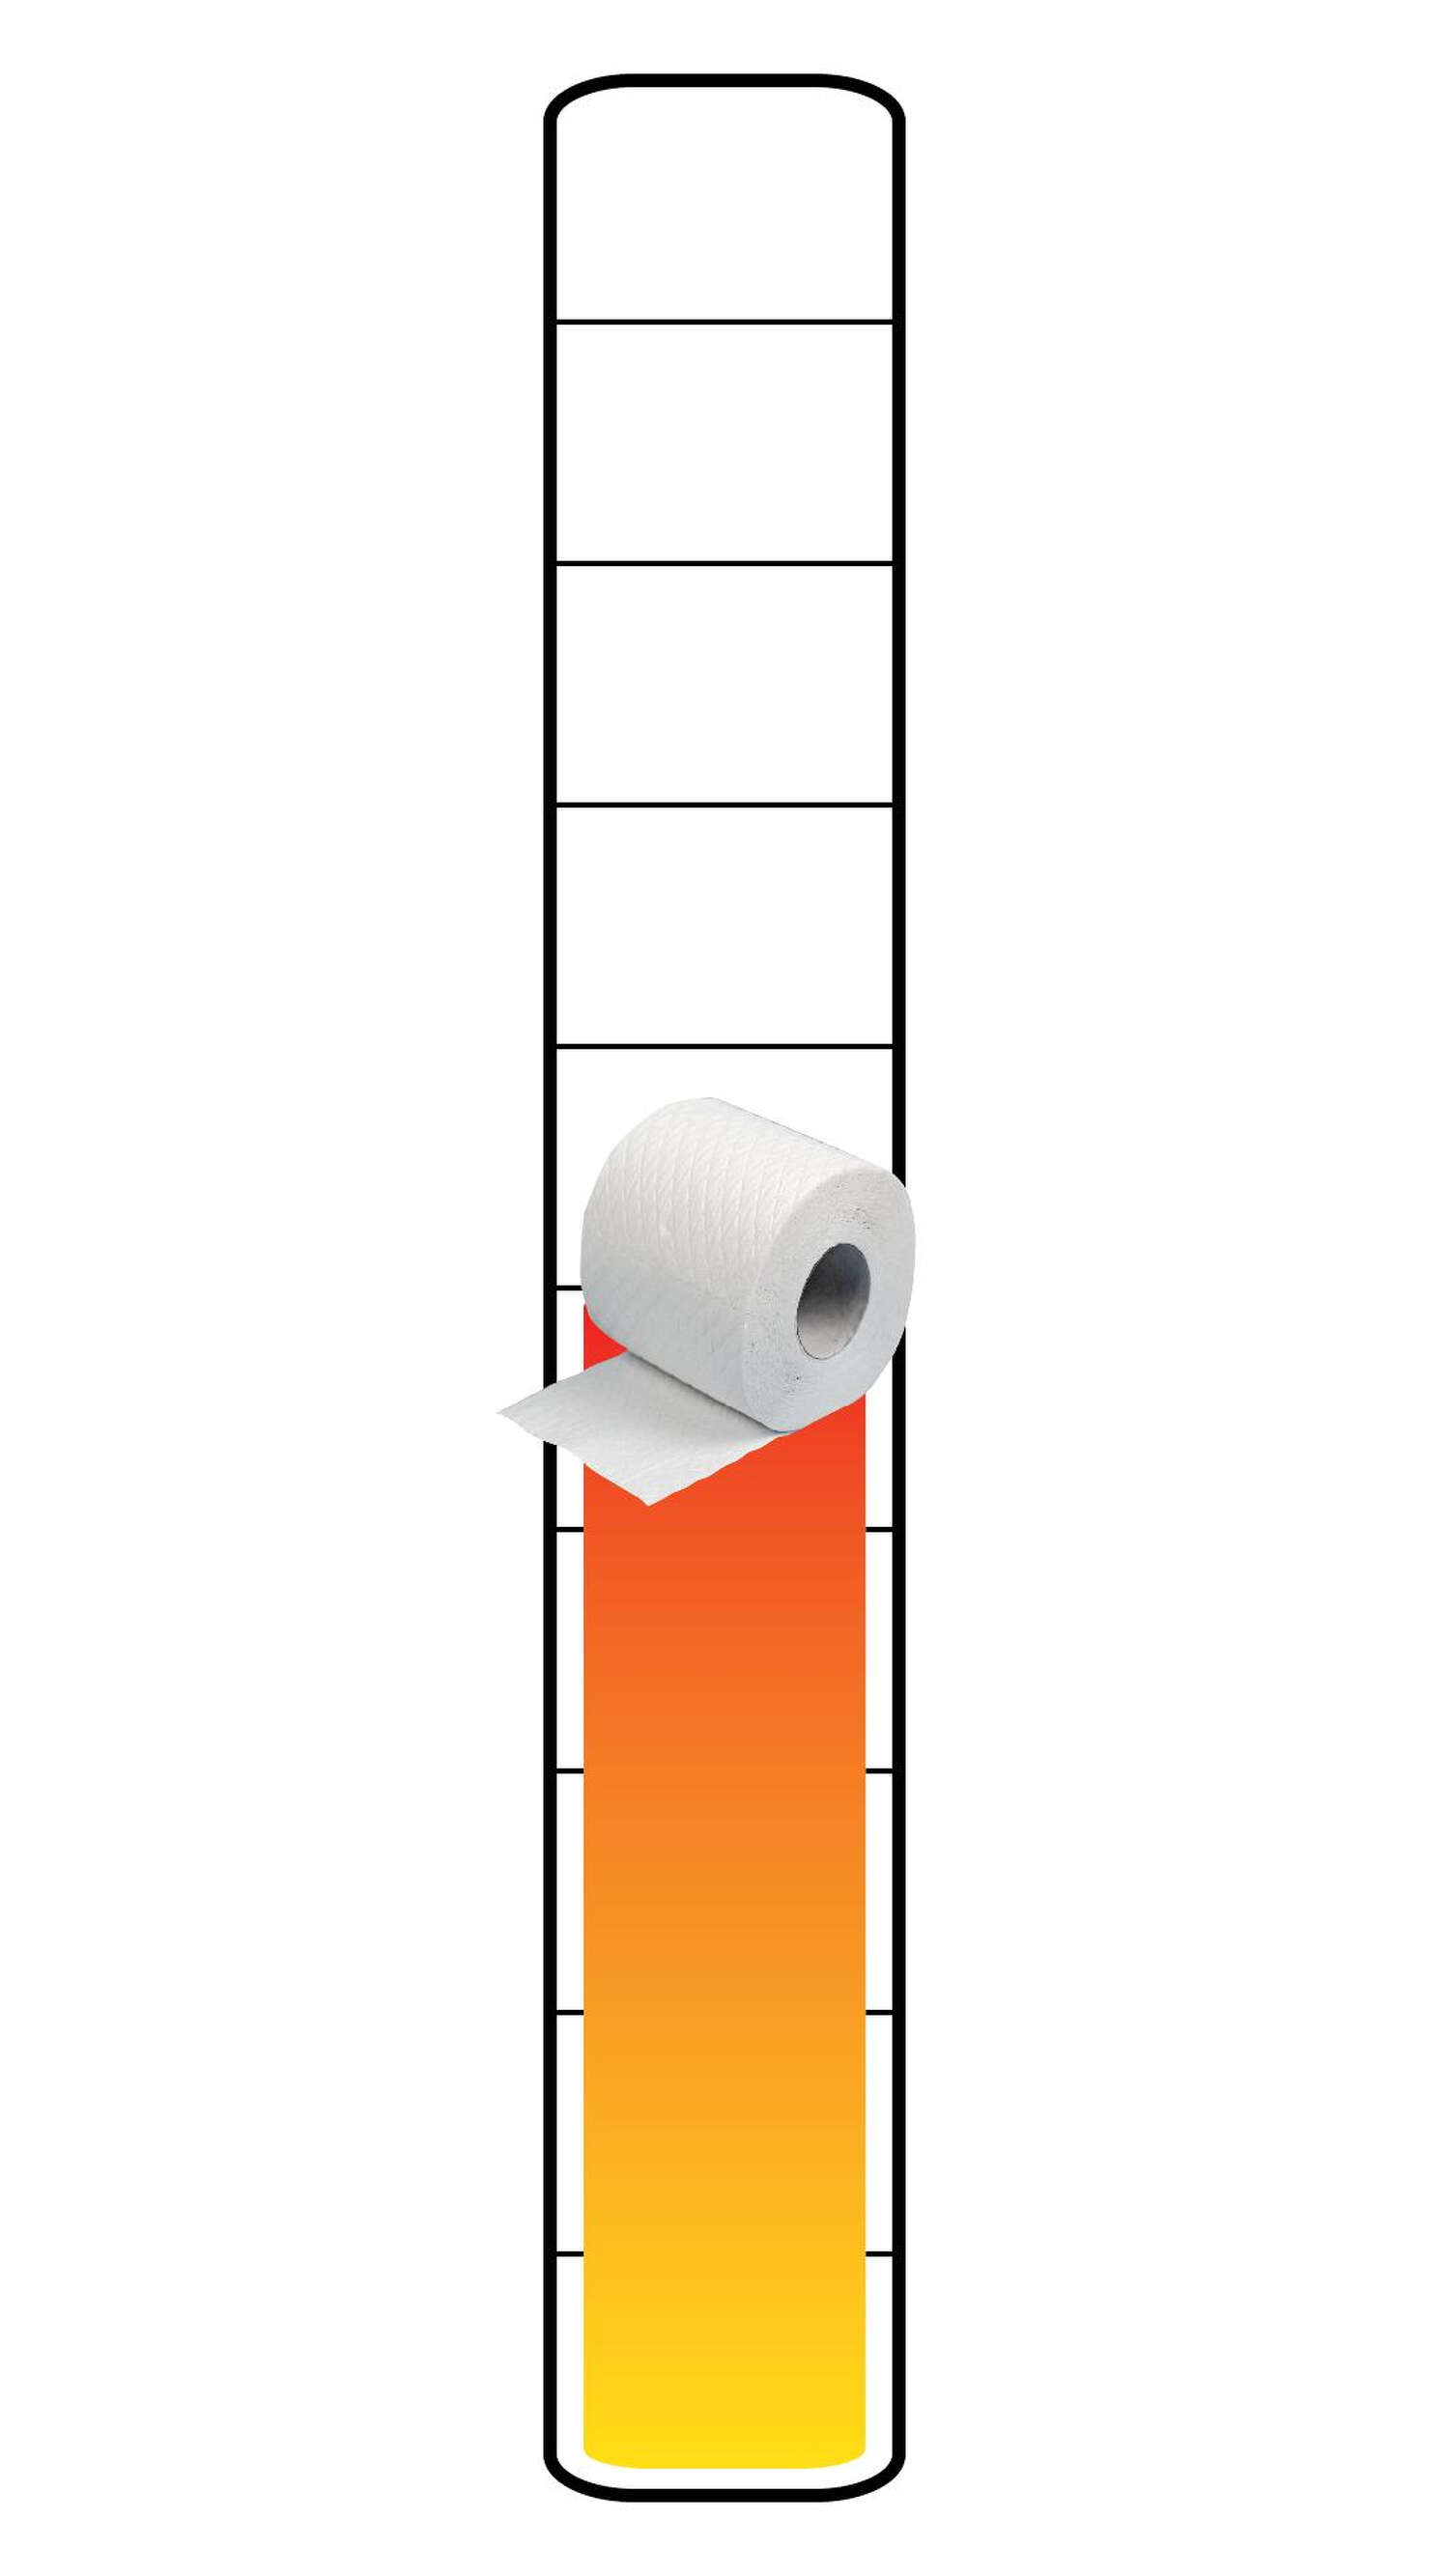 Meter: 5/10. Toilet paper icon.